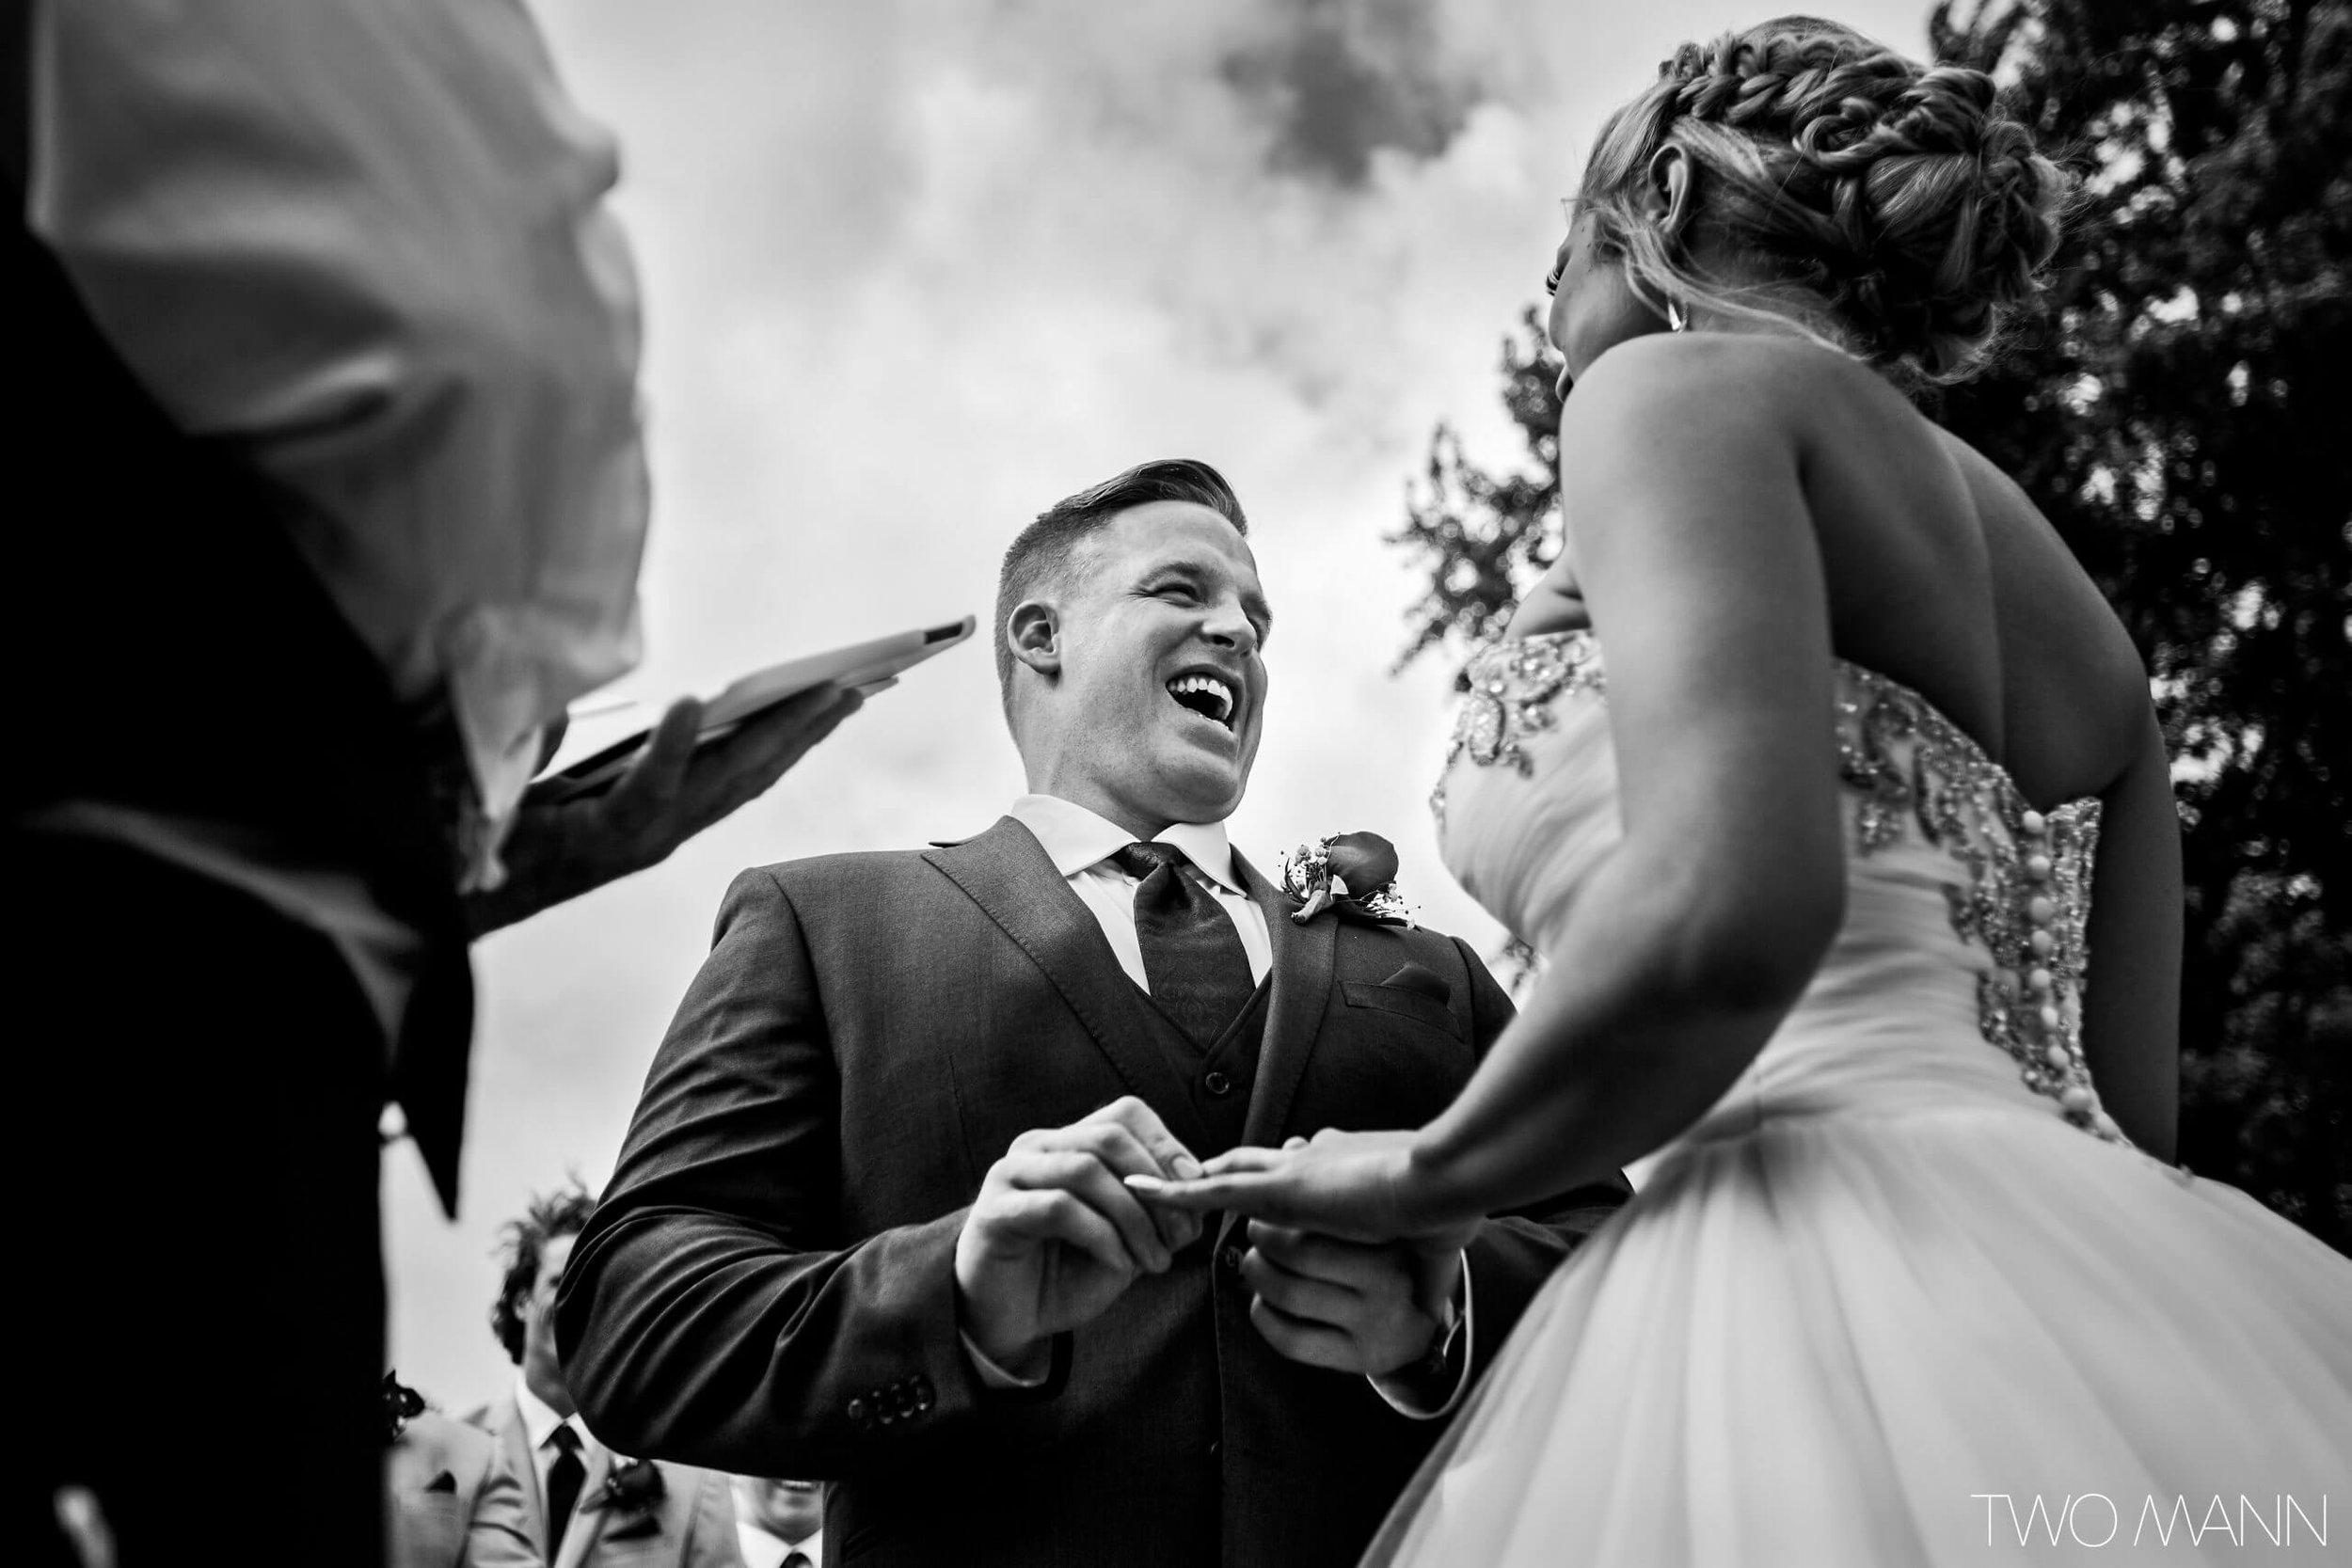 Two-Mann-Studios-Worlds-Best-Wedding-Photography-Best-of-2016-057-2560x1707.jpg